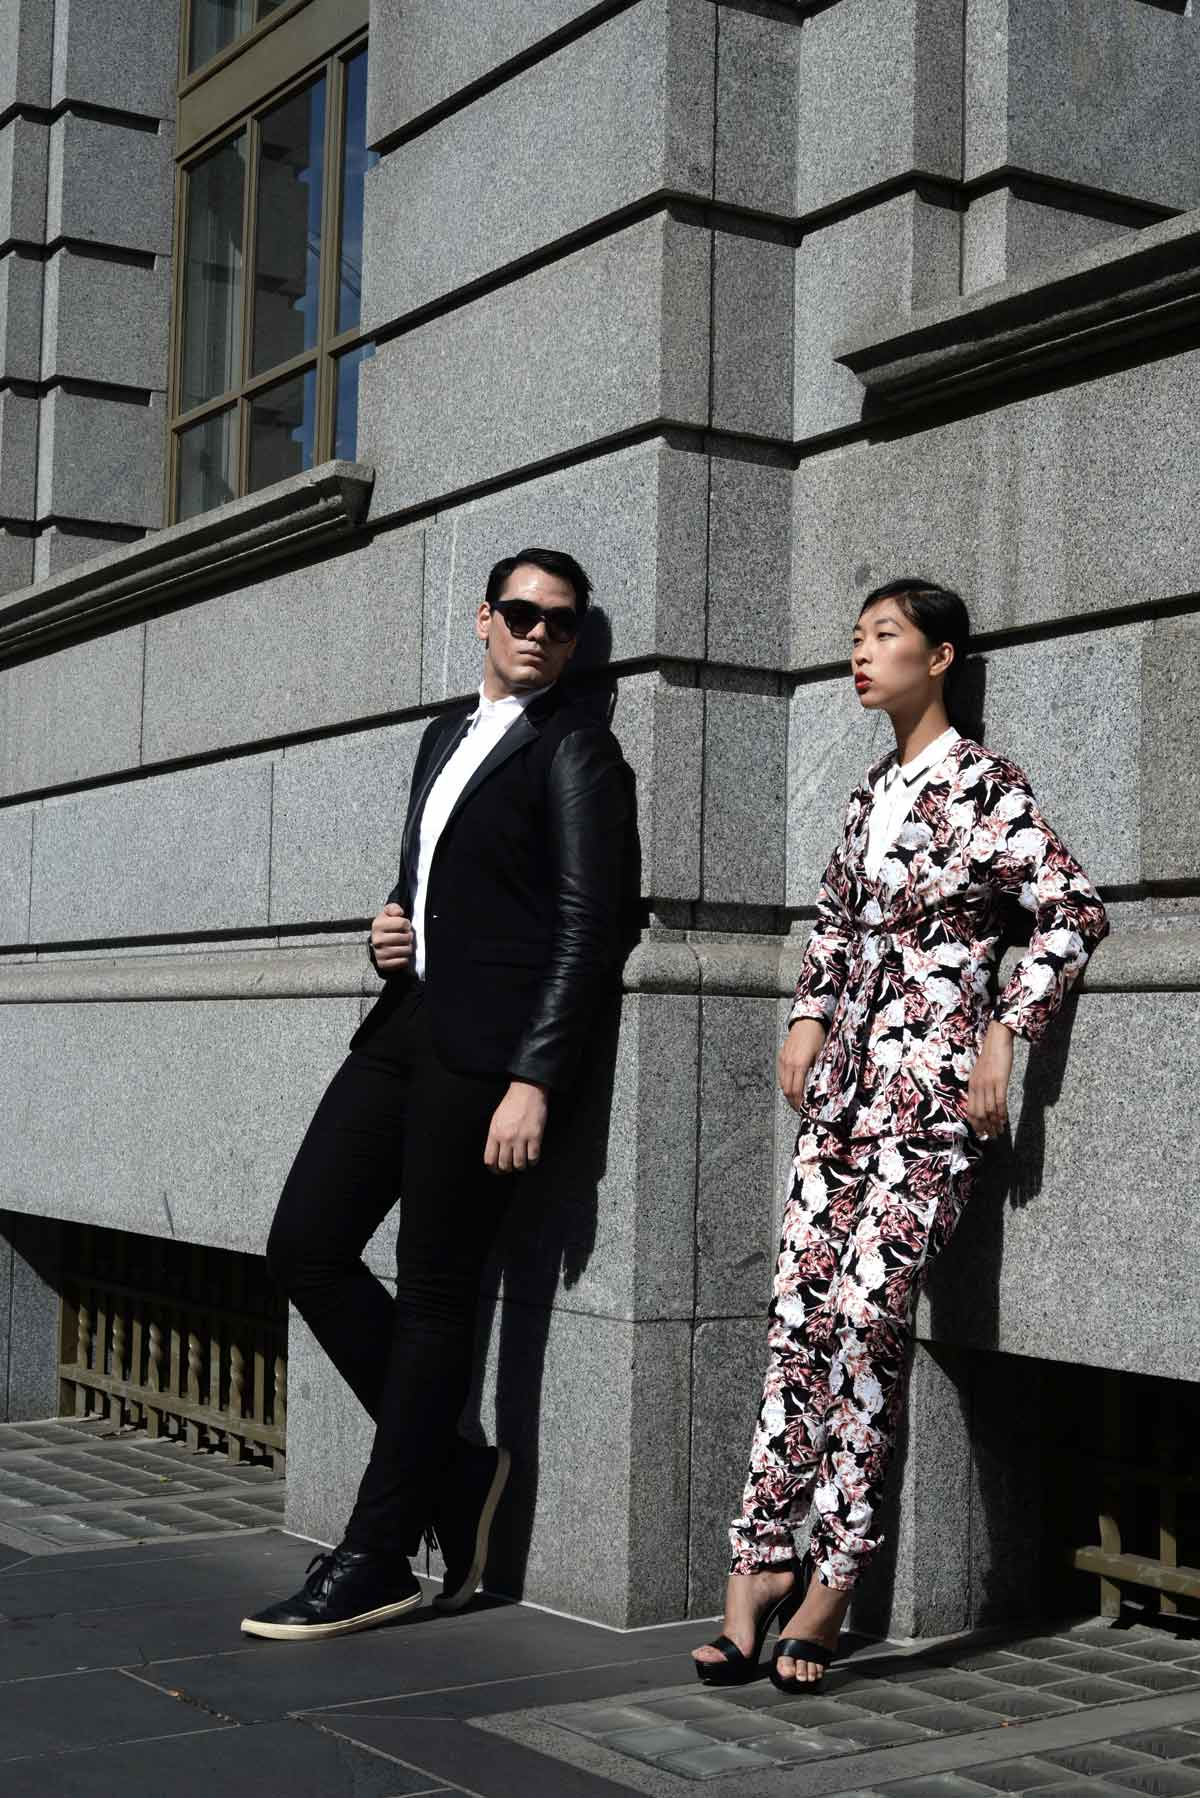 street style, blogging duo, zhang pasi